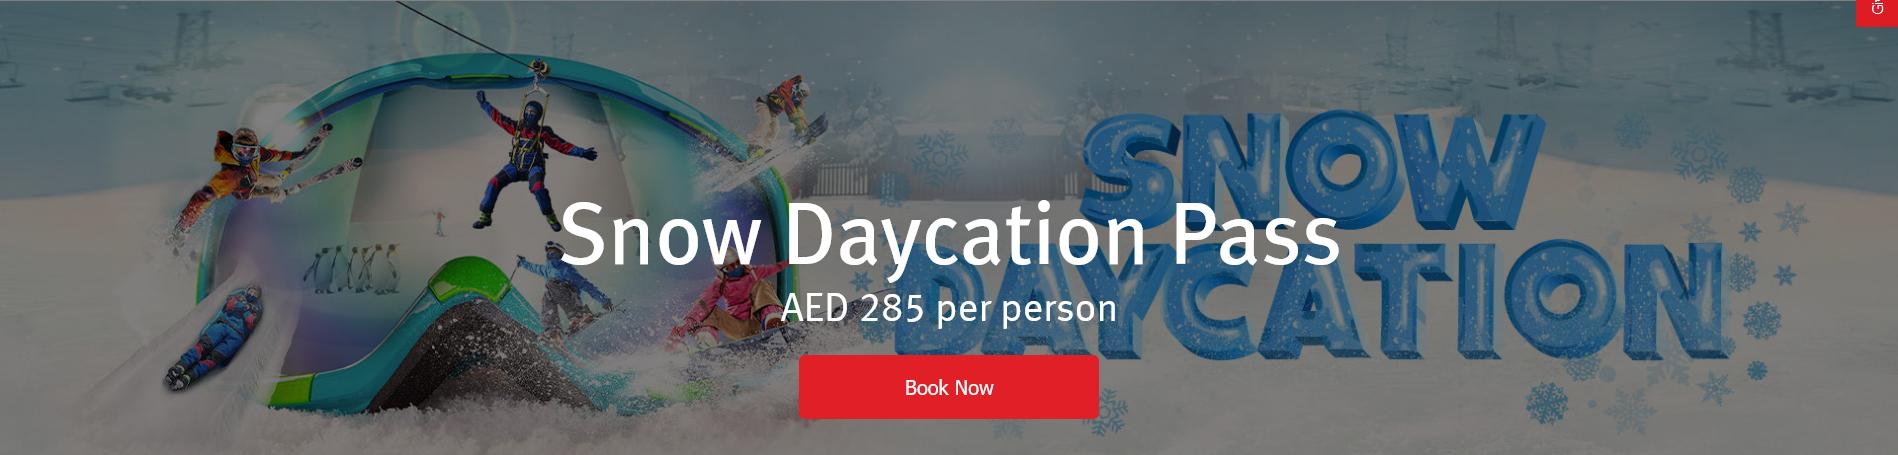 Ski Dubai coupon code